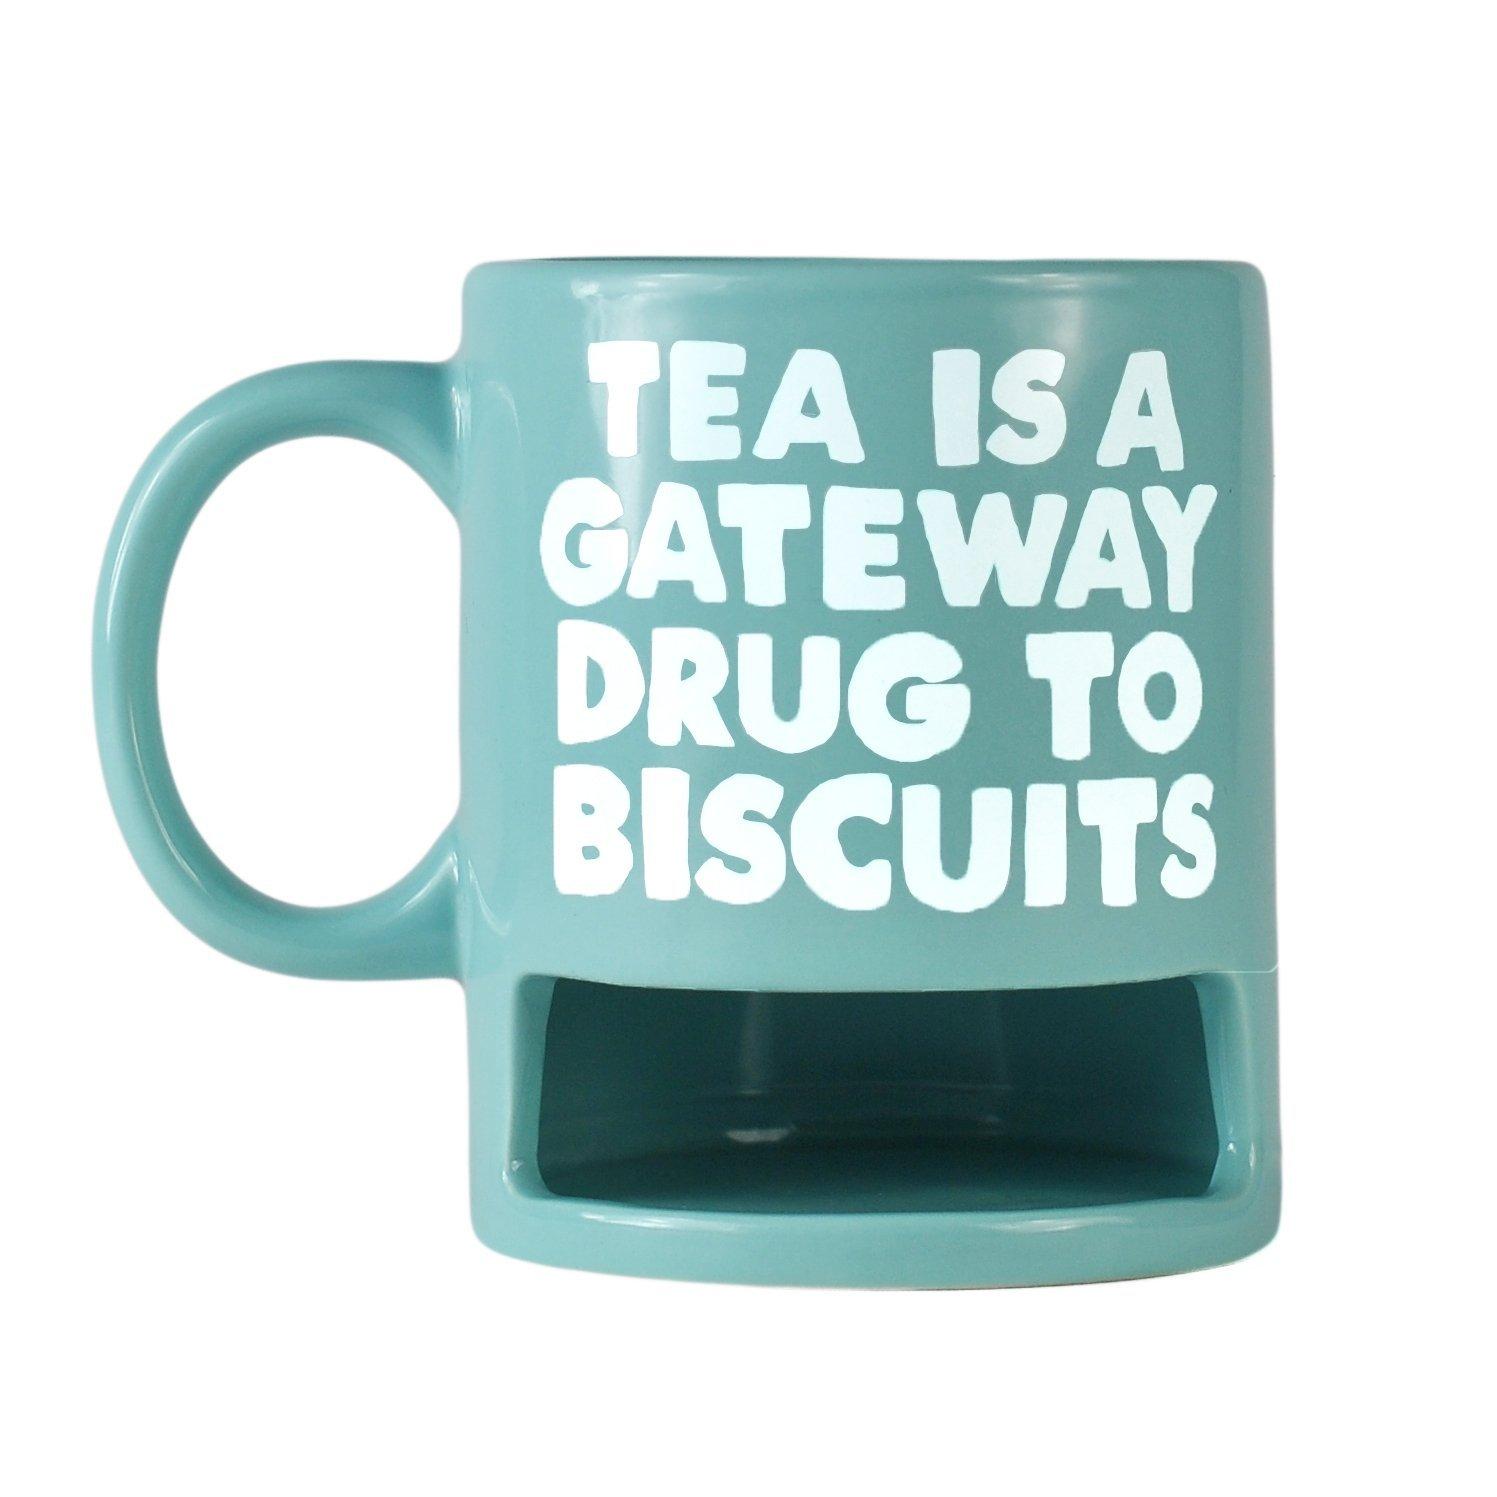 JOLLY AWESOME TEA IS A GATEWAY DRUG BISCUIT HOLDER MUG CERAMIC ...